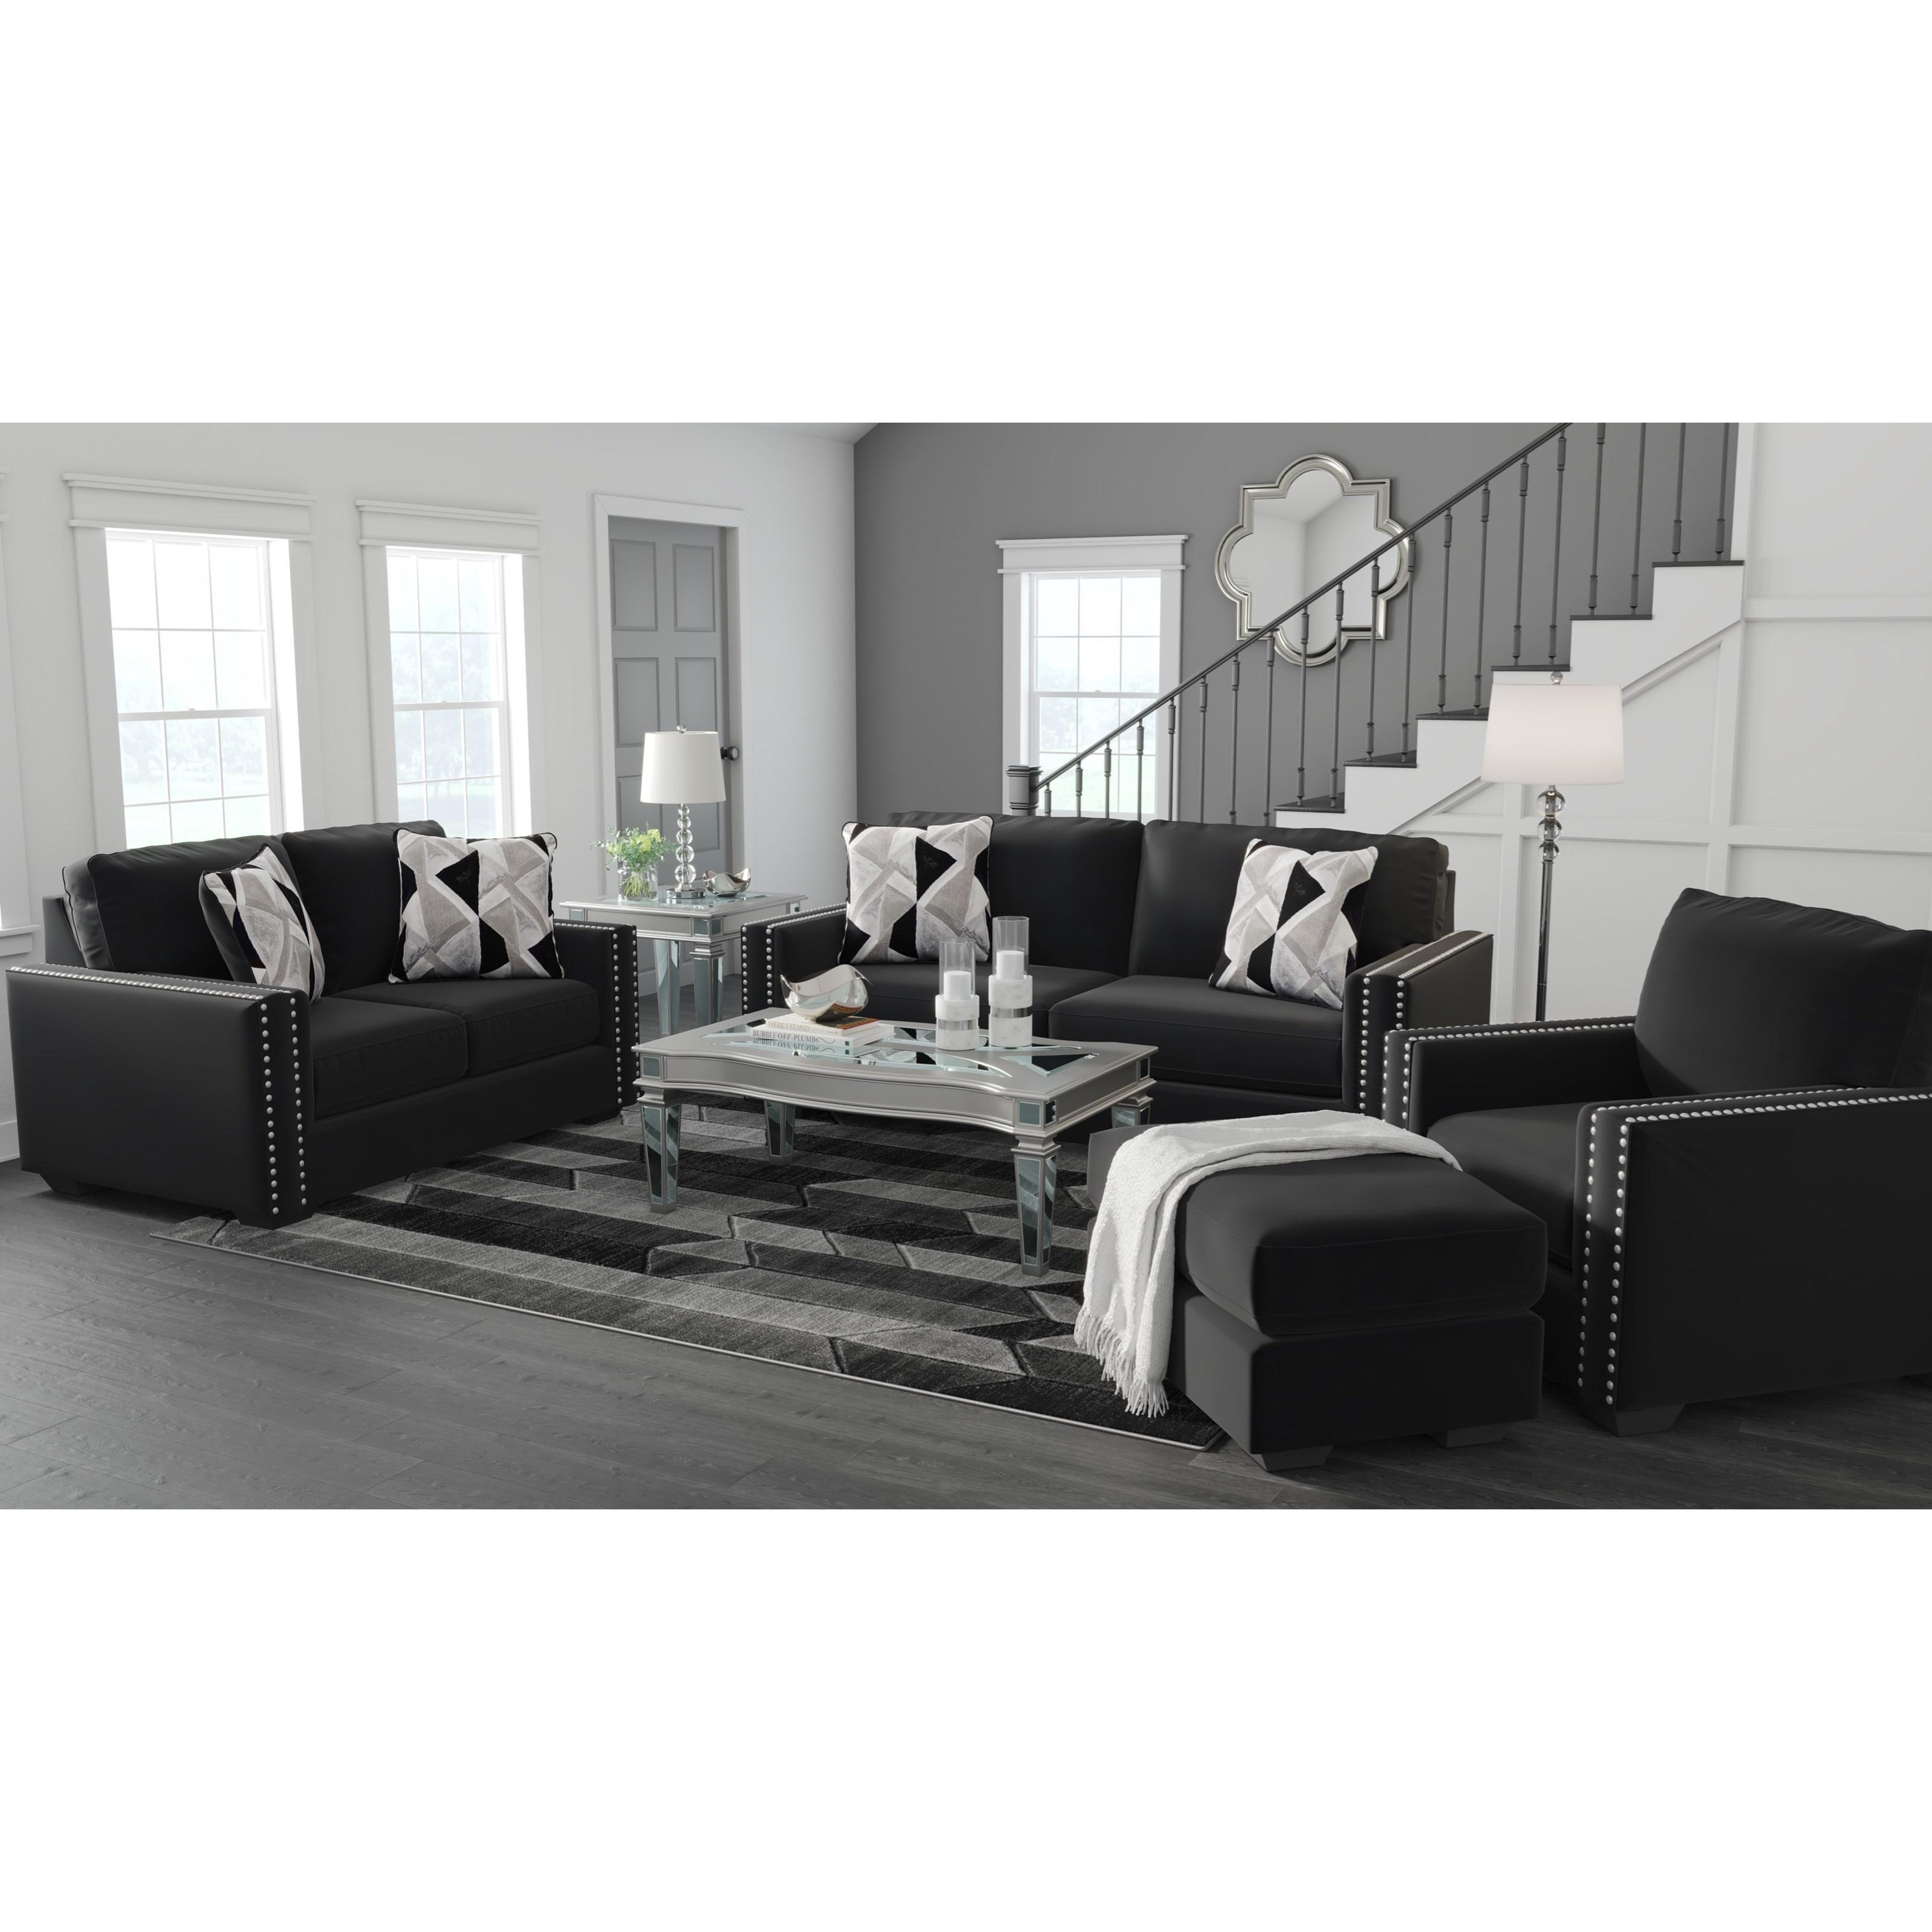 Gleston Living Room Group by Ashley (Signature Design) at Johnny Janosik